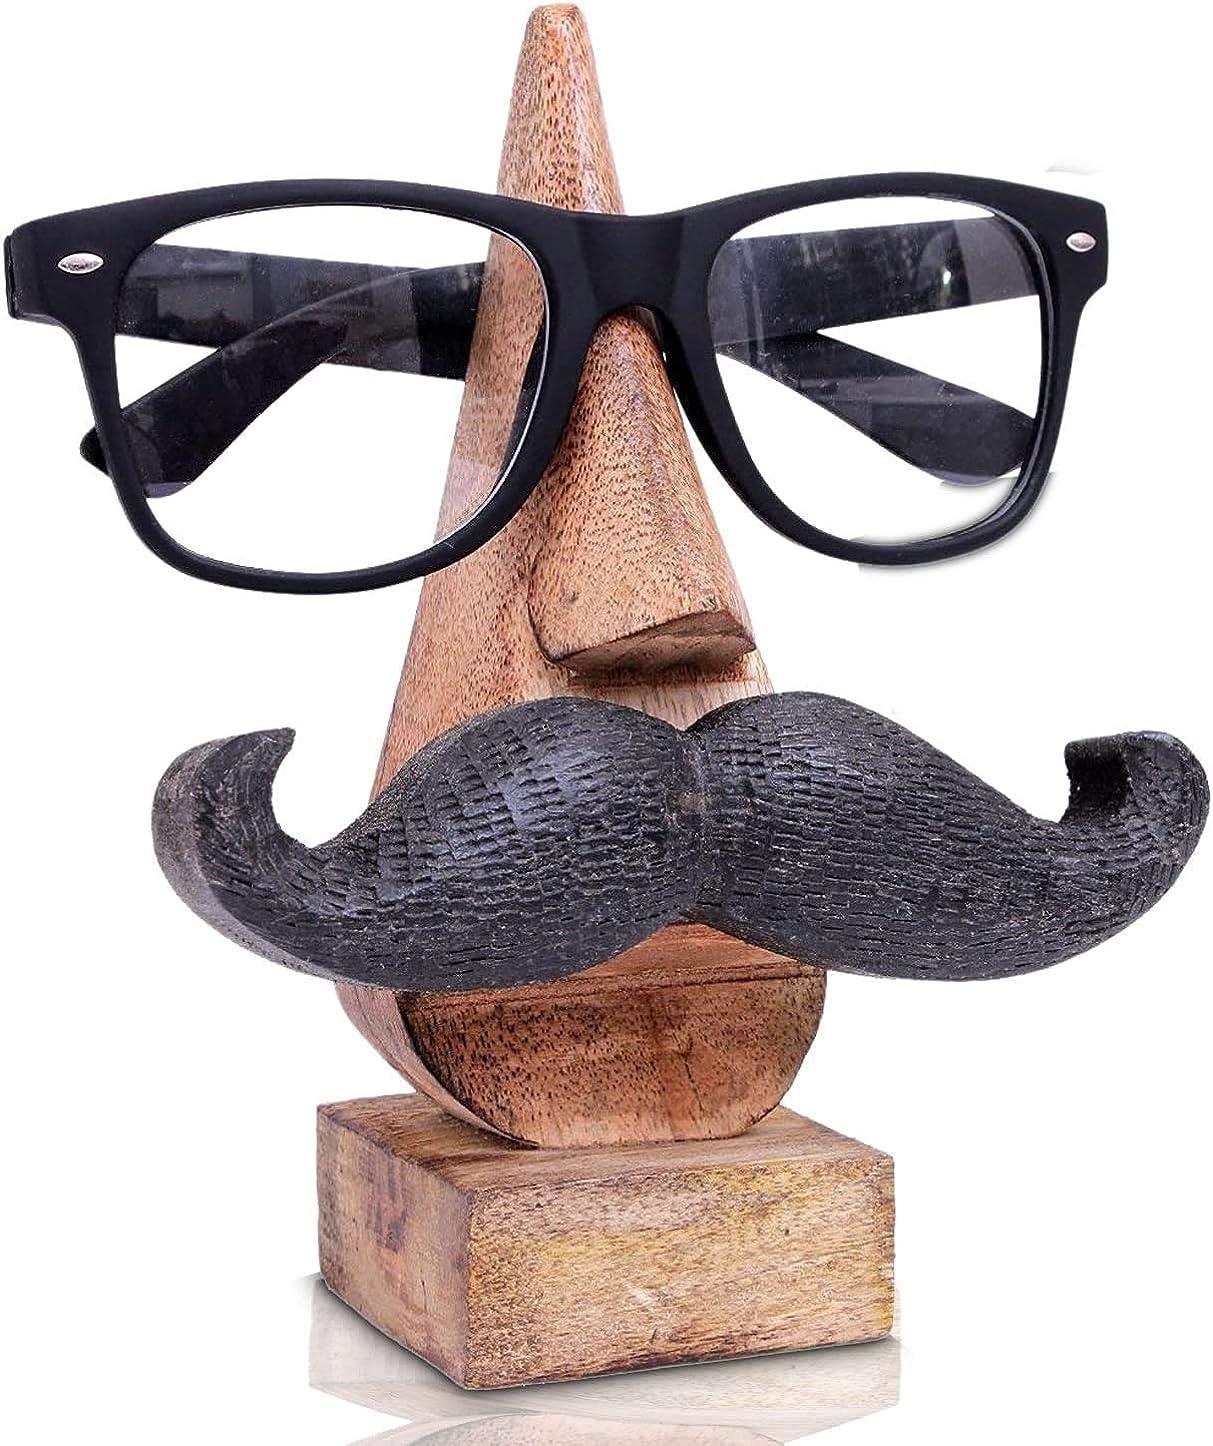 ARTISENIA Wooden Mustache Eyeglass Spectacle Holder Handmade Display Stand for Office Desk Home Decor Brown